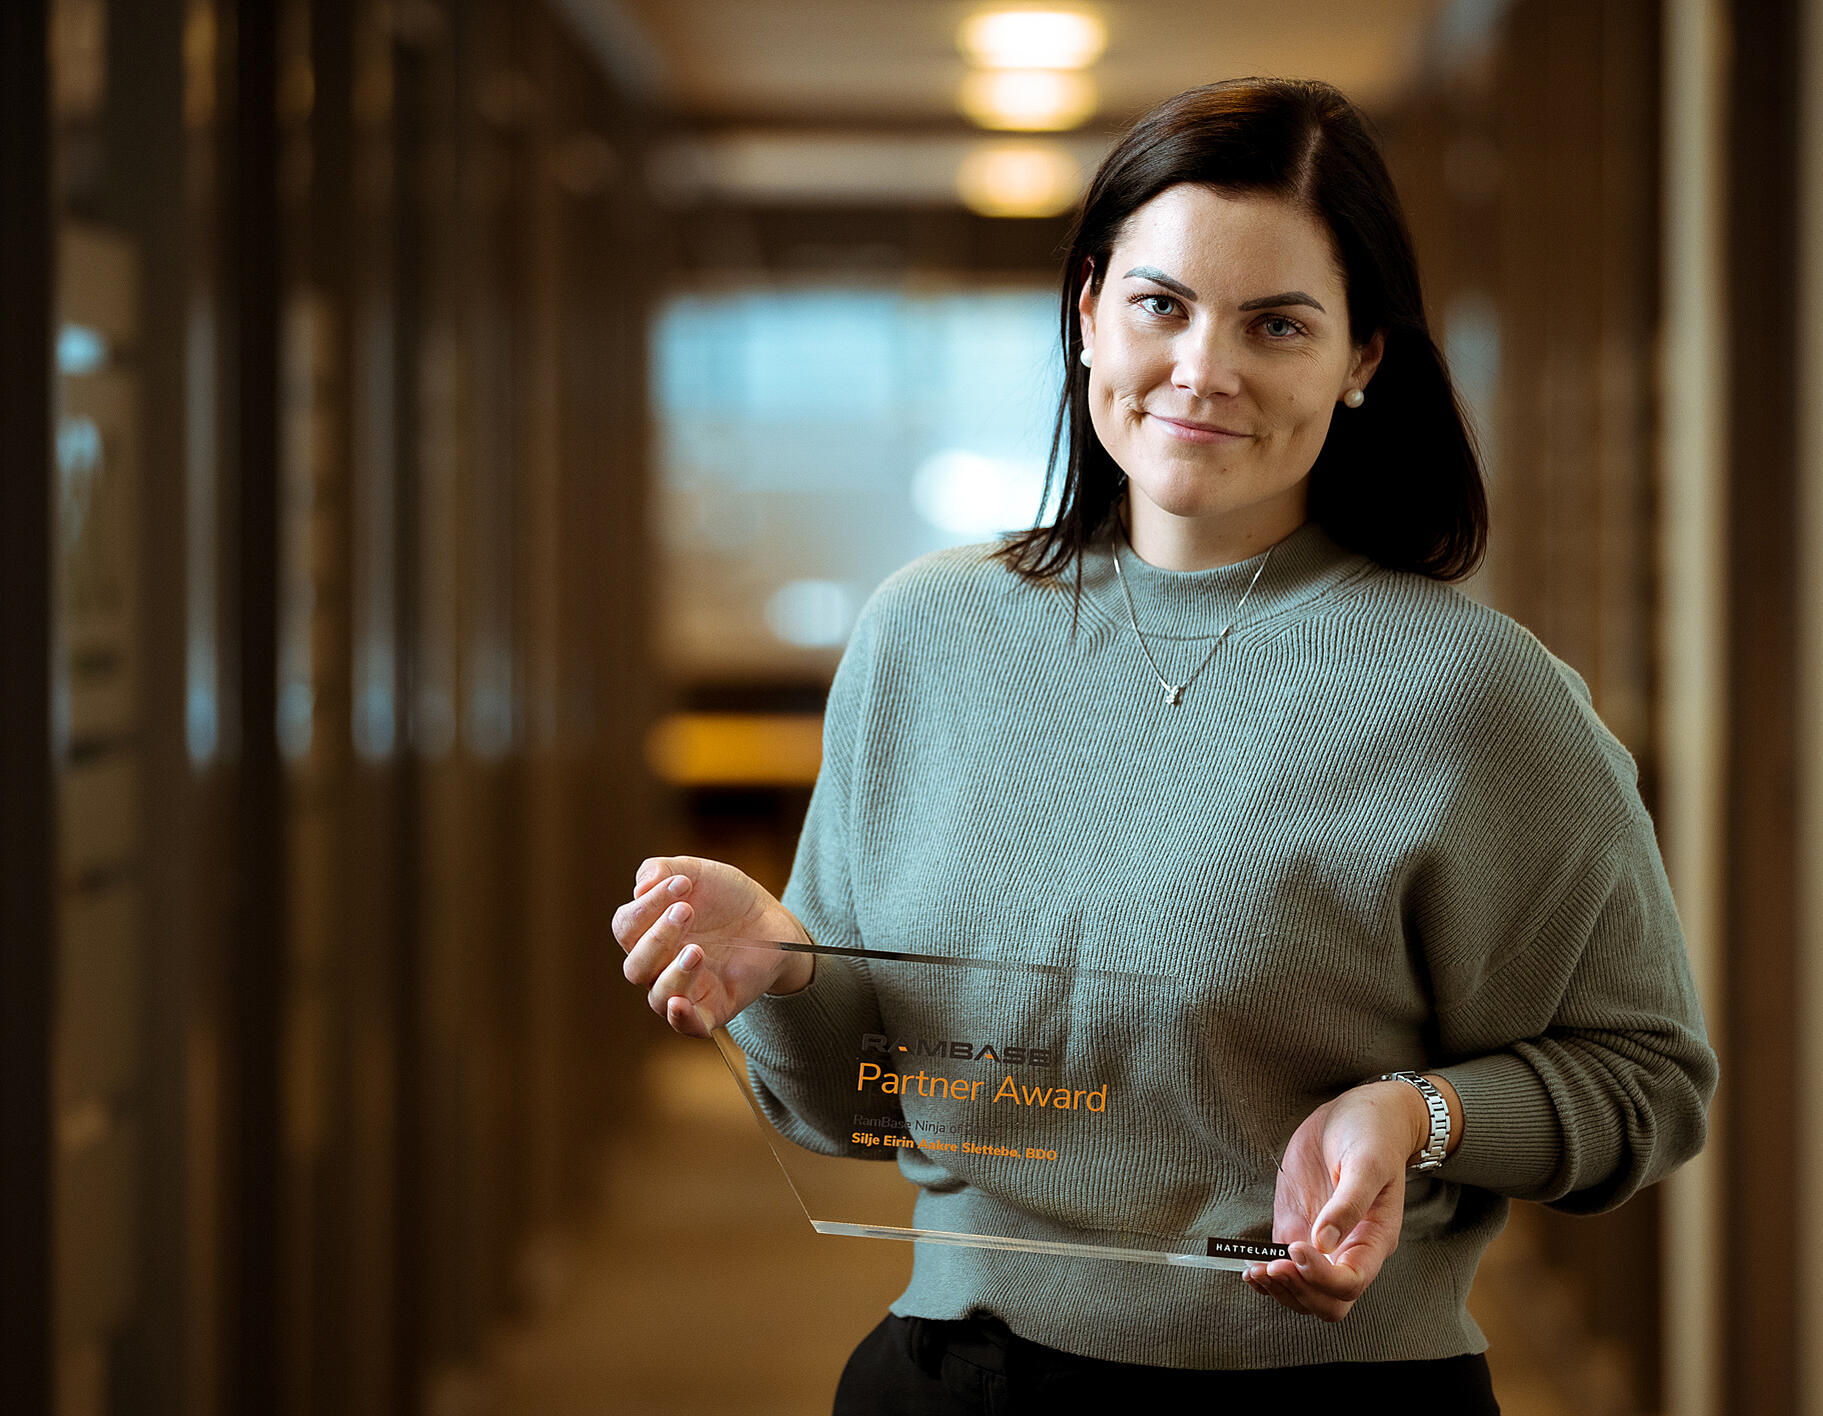 Silje from BDO winner of the RamBase award 2020